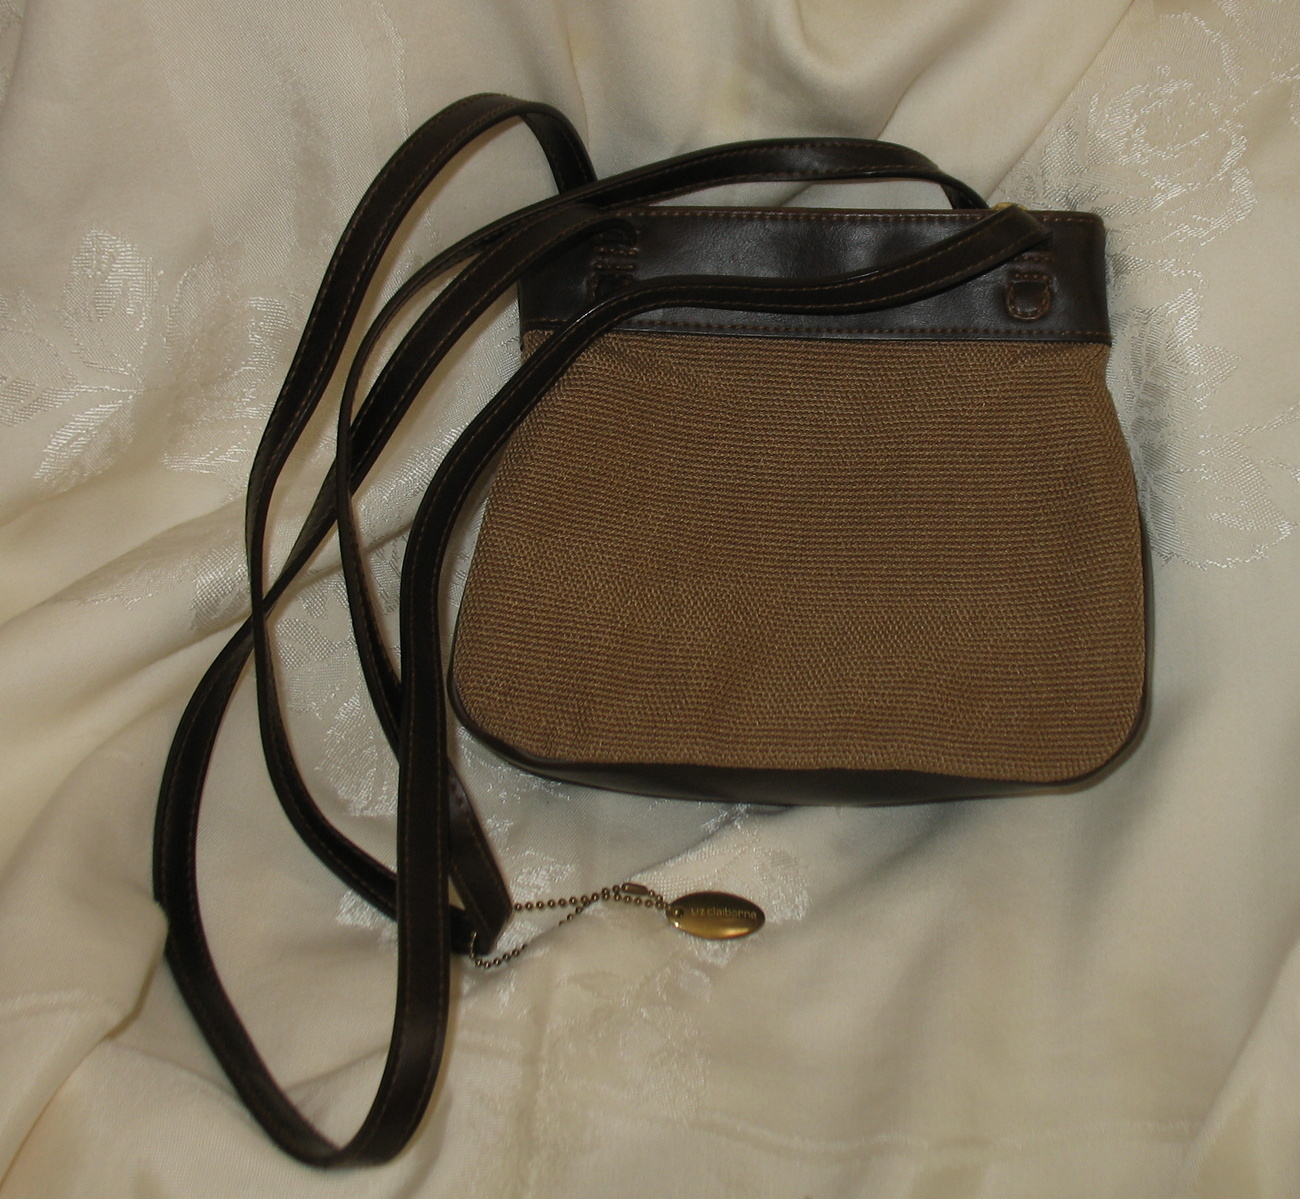 Vintage Liz Claiborne brown/beige Handbag Purse Leather Like